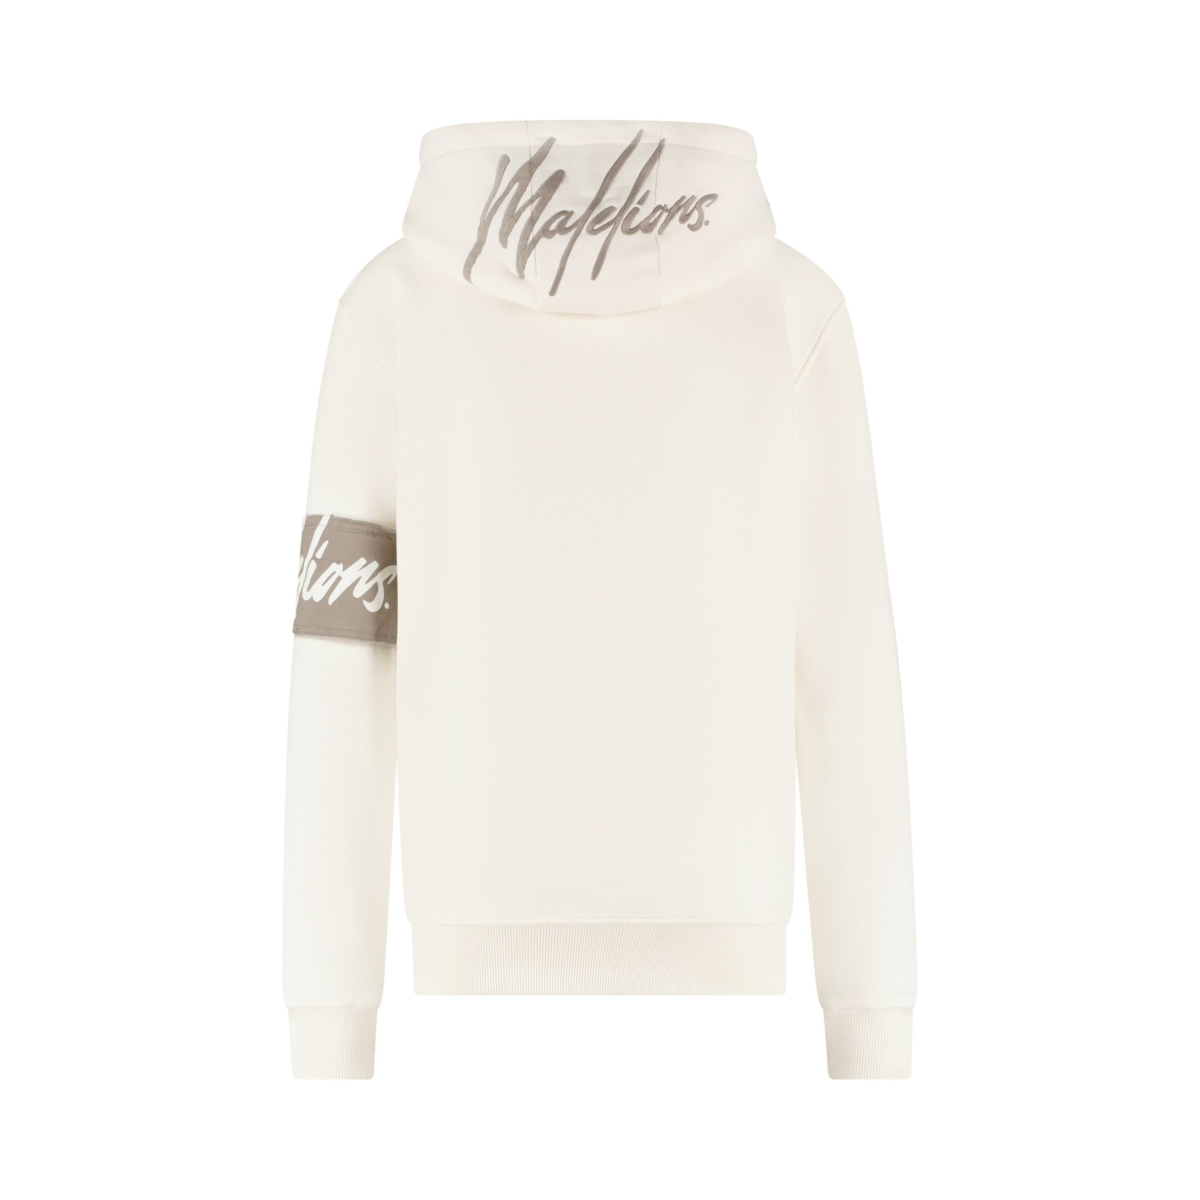 MALELIONS HOODIE NEW OFF WHITE / Grey Logo